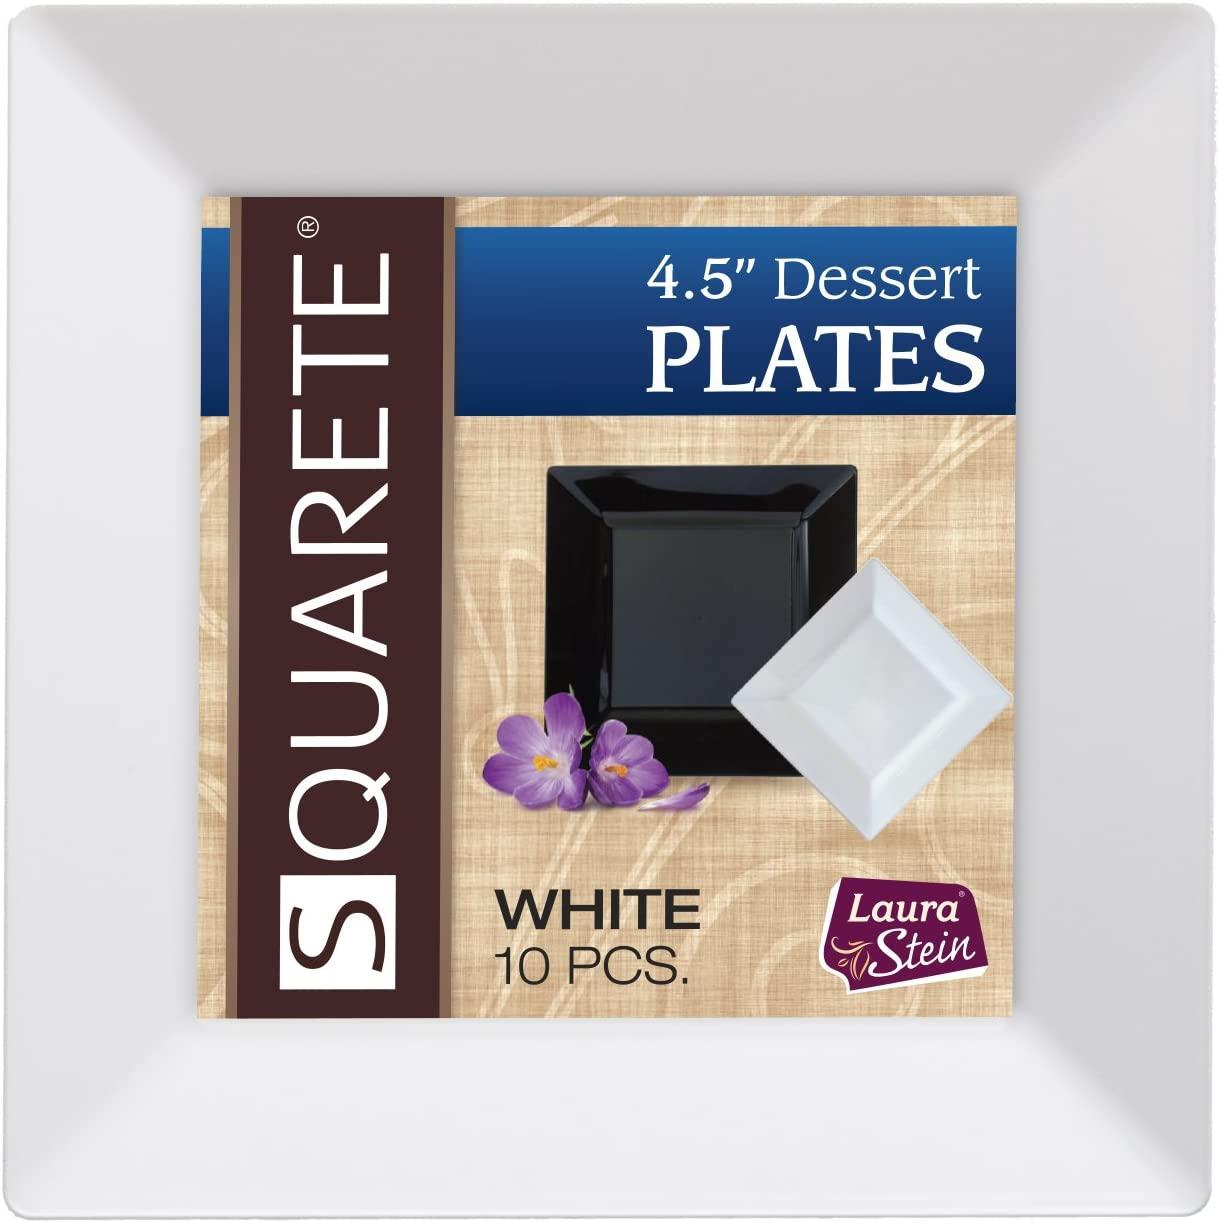 Squarete White Elegant Wedding Party Disposable Plates/Bowls (10 Pcs Per Pack) (3 Pack (30), 4.5